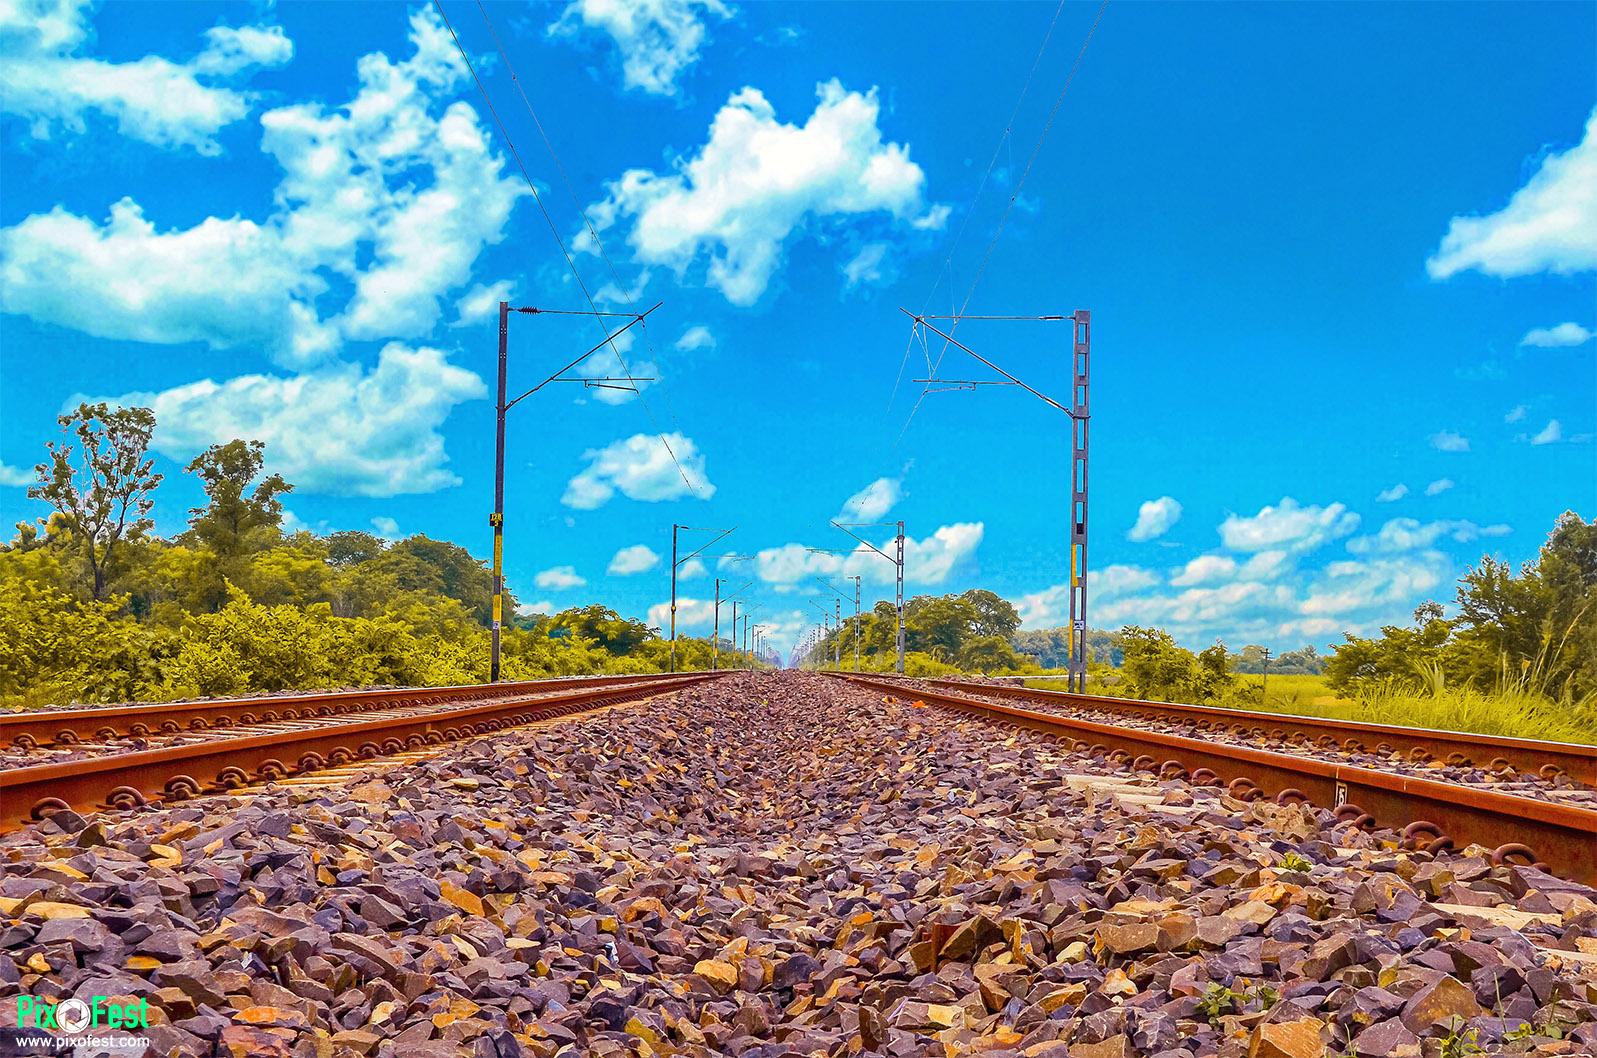 railline,line,railwaytrack,track,sky,landscape,landscapes,indianrailway,pixofest